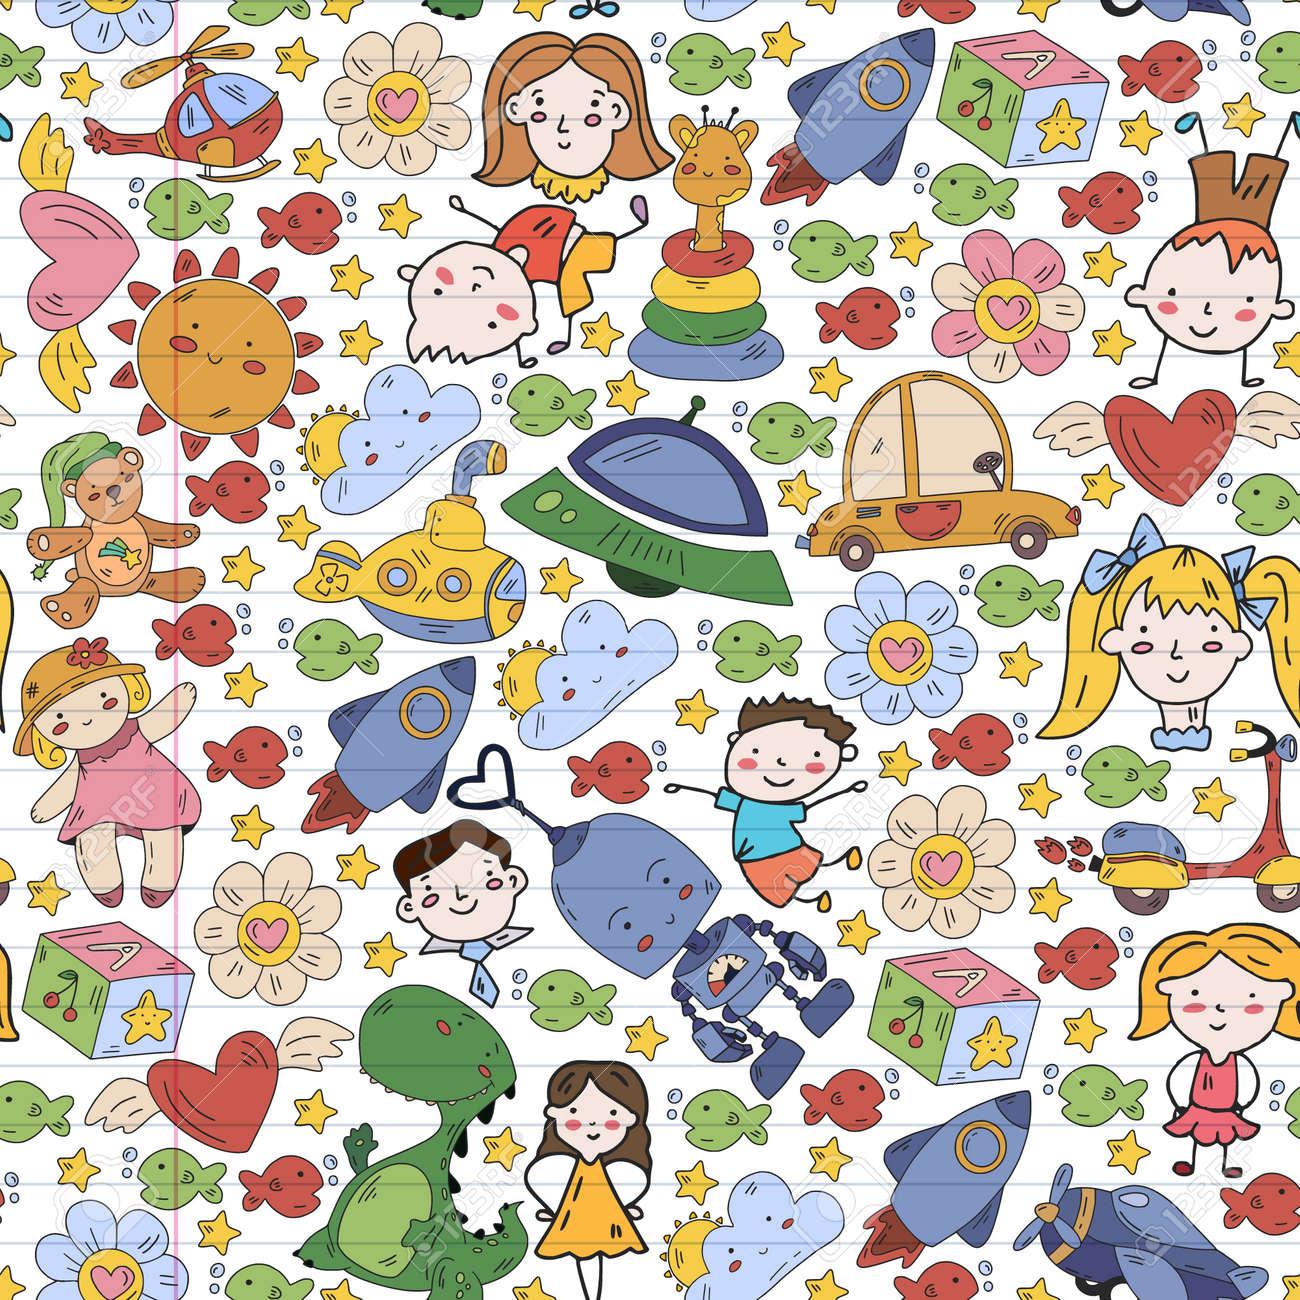 Children play with toys in the kindergarten. Kids playground. Education, creativity, imagination. - 173211530